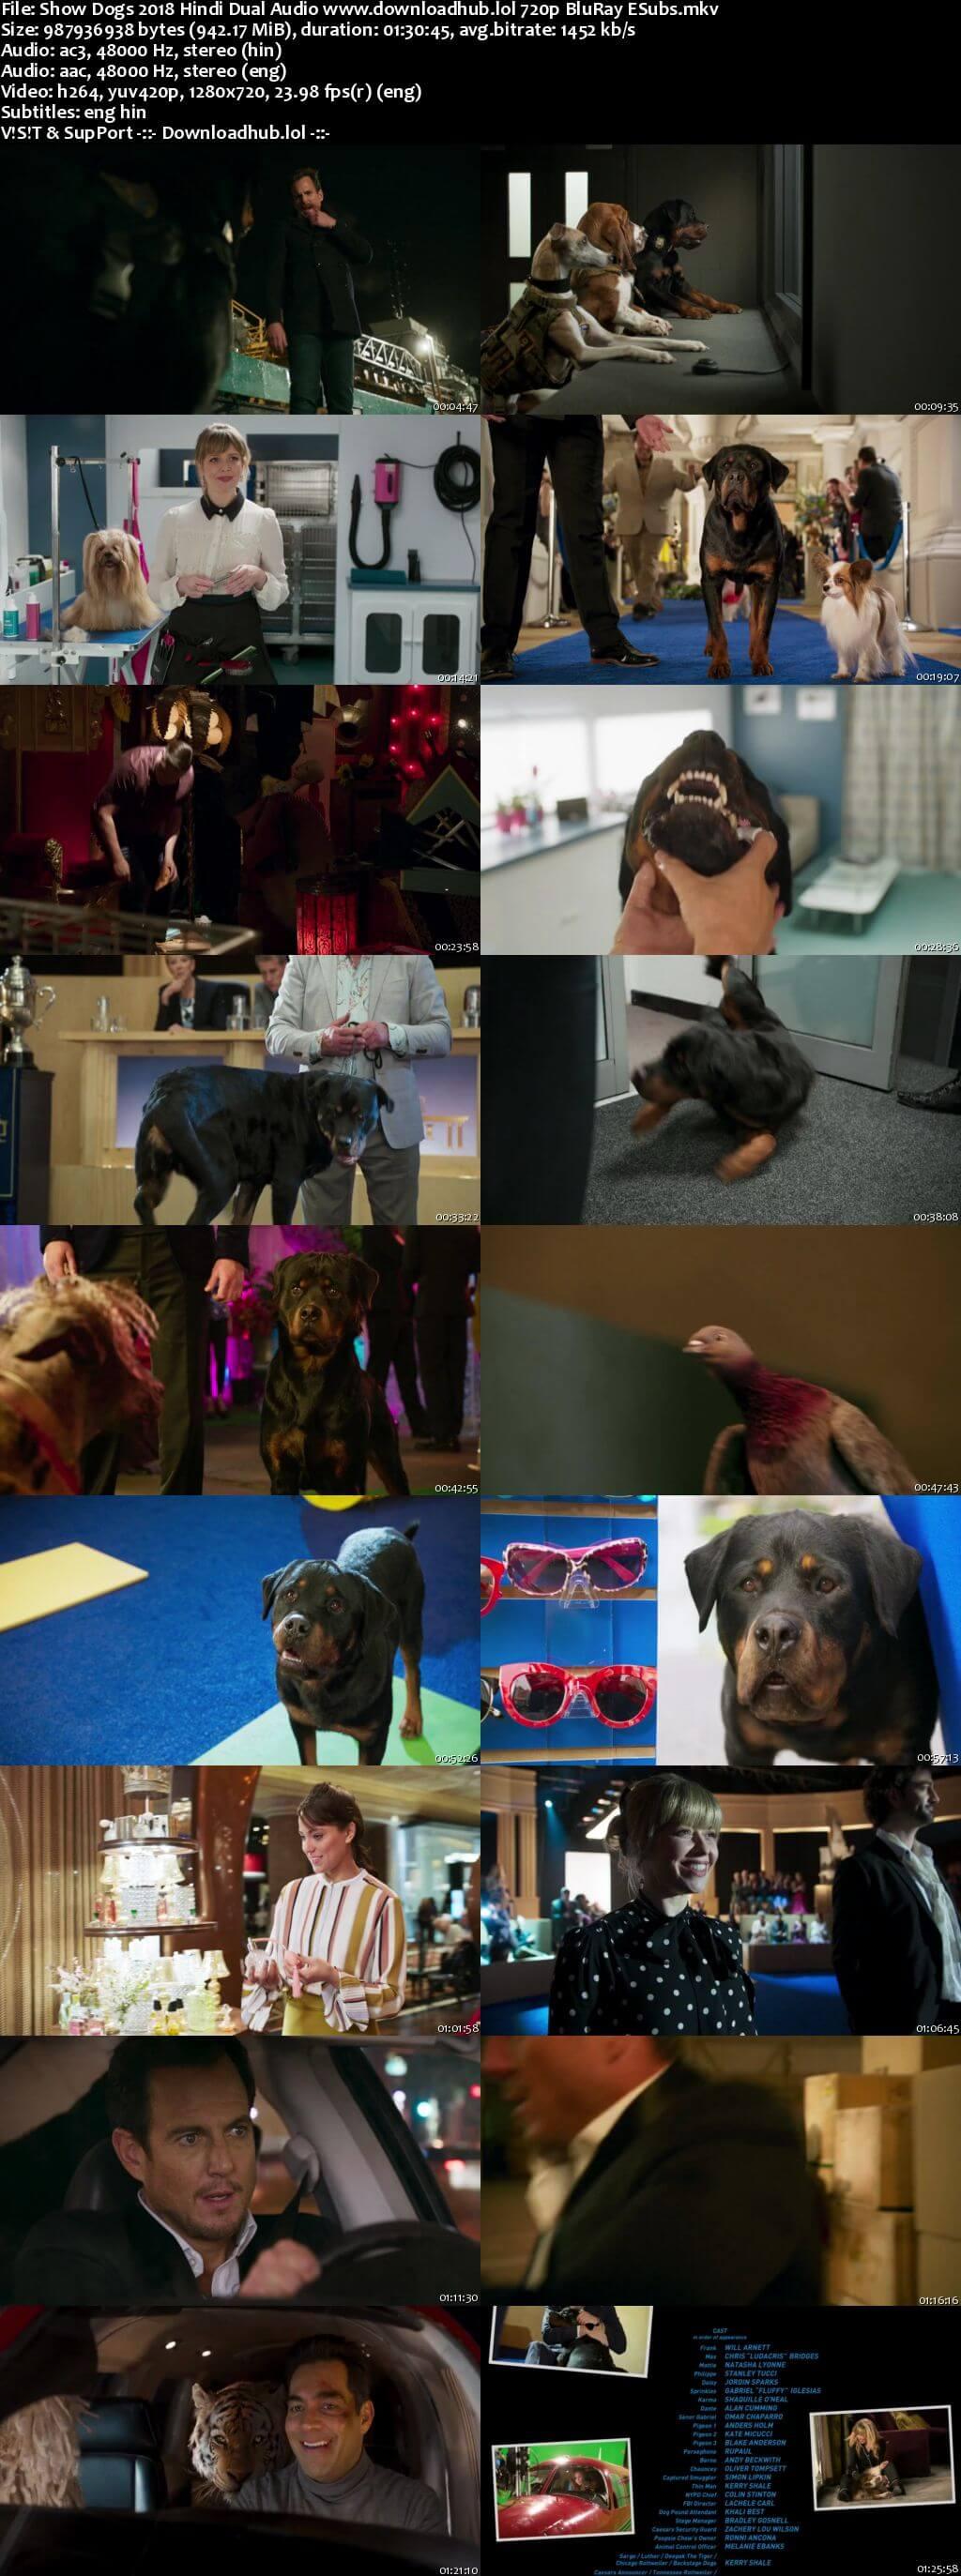 Show Dogs 2018 Hindi Dual Audio 720p BluRay ESubs